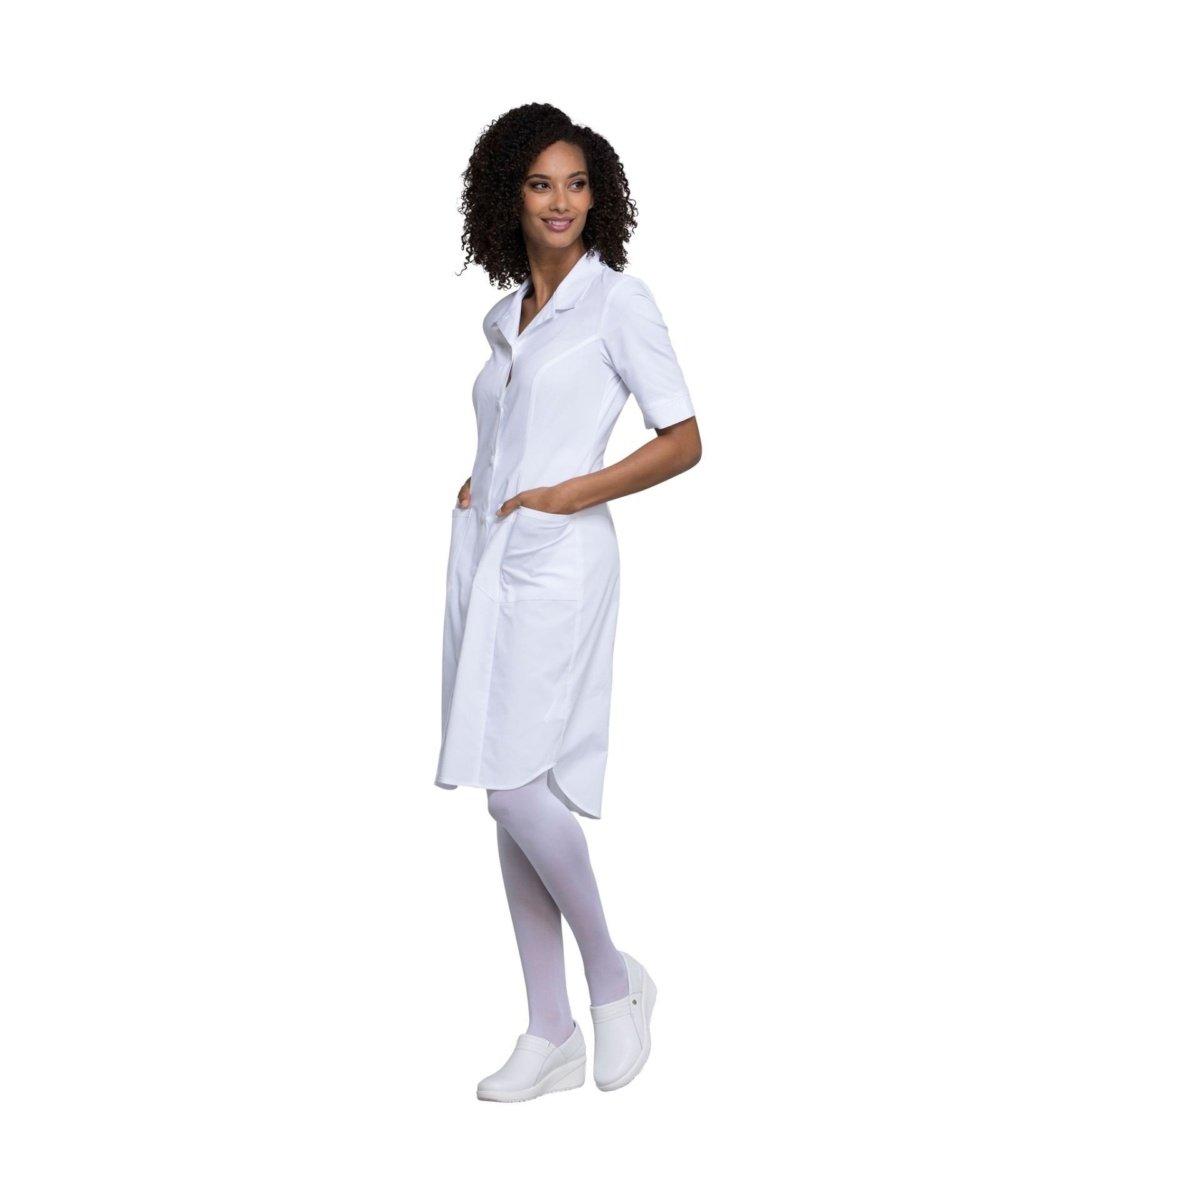 Женский медицинский халат с коротким рукавом Cherokee.